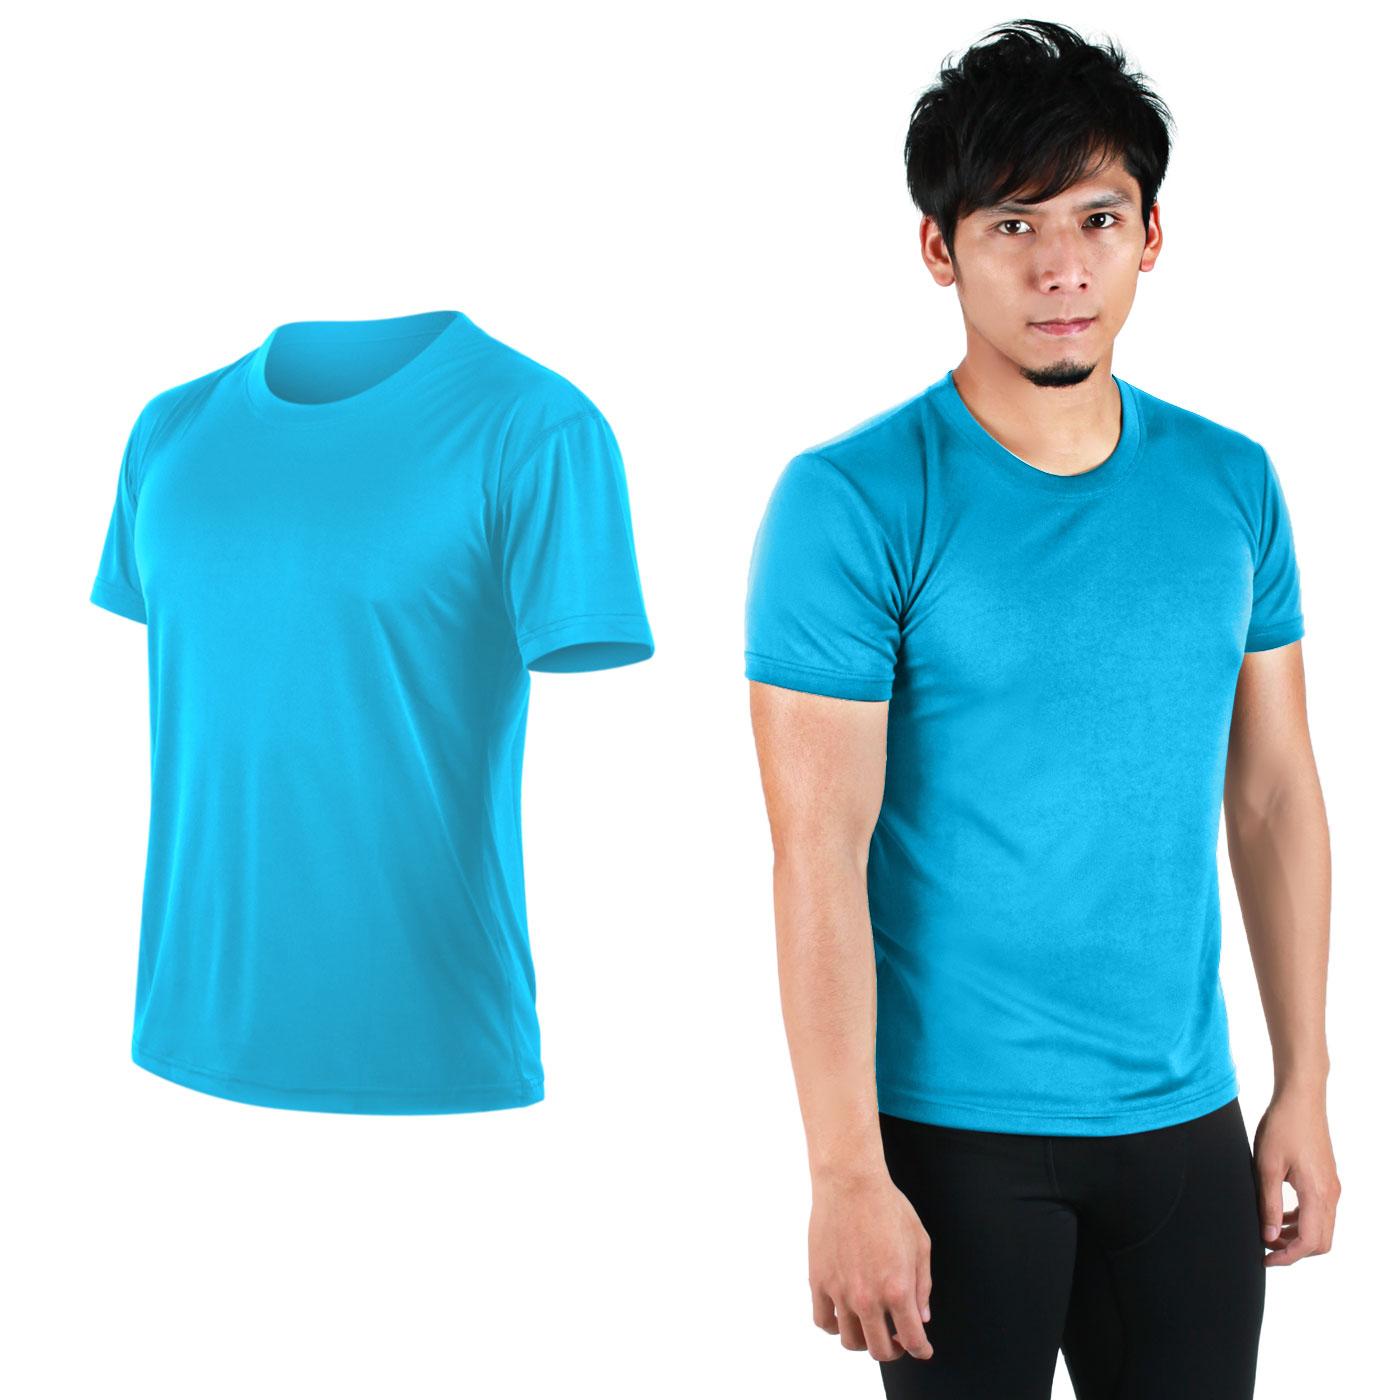 HODARLA FLARE 100 吸濕排汗衫3108301 - 亮藍